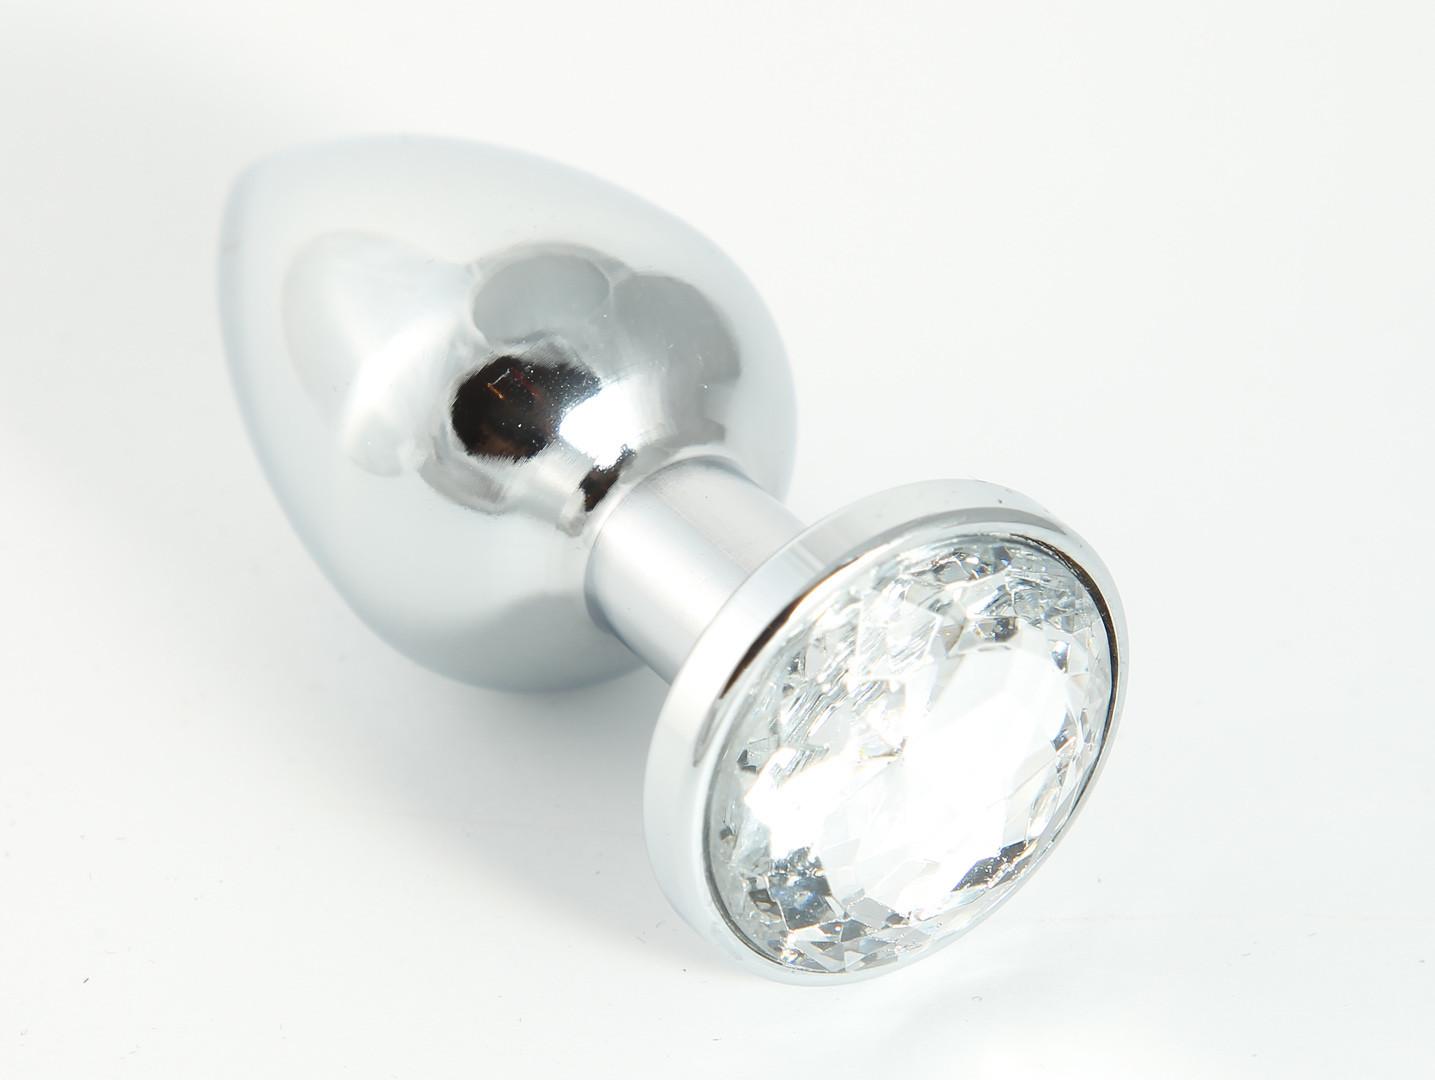 Metallplug klein mit transparentem Kristall